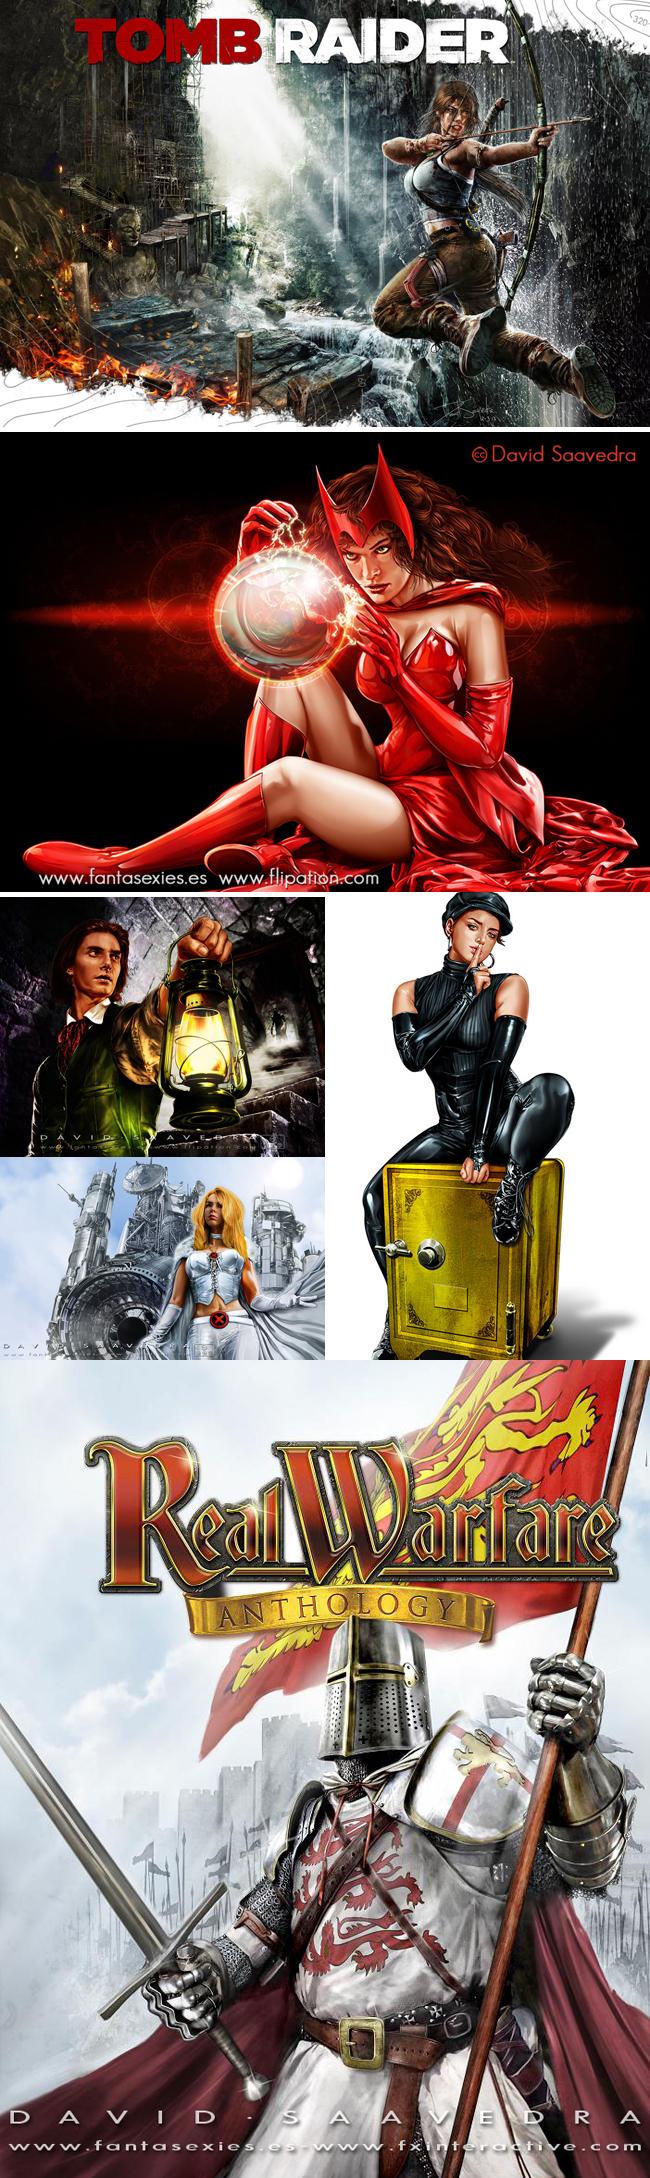 David Saavedra-ilustracion-digital-trabajos-portadas-videojuegos